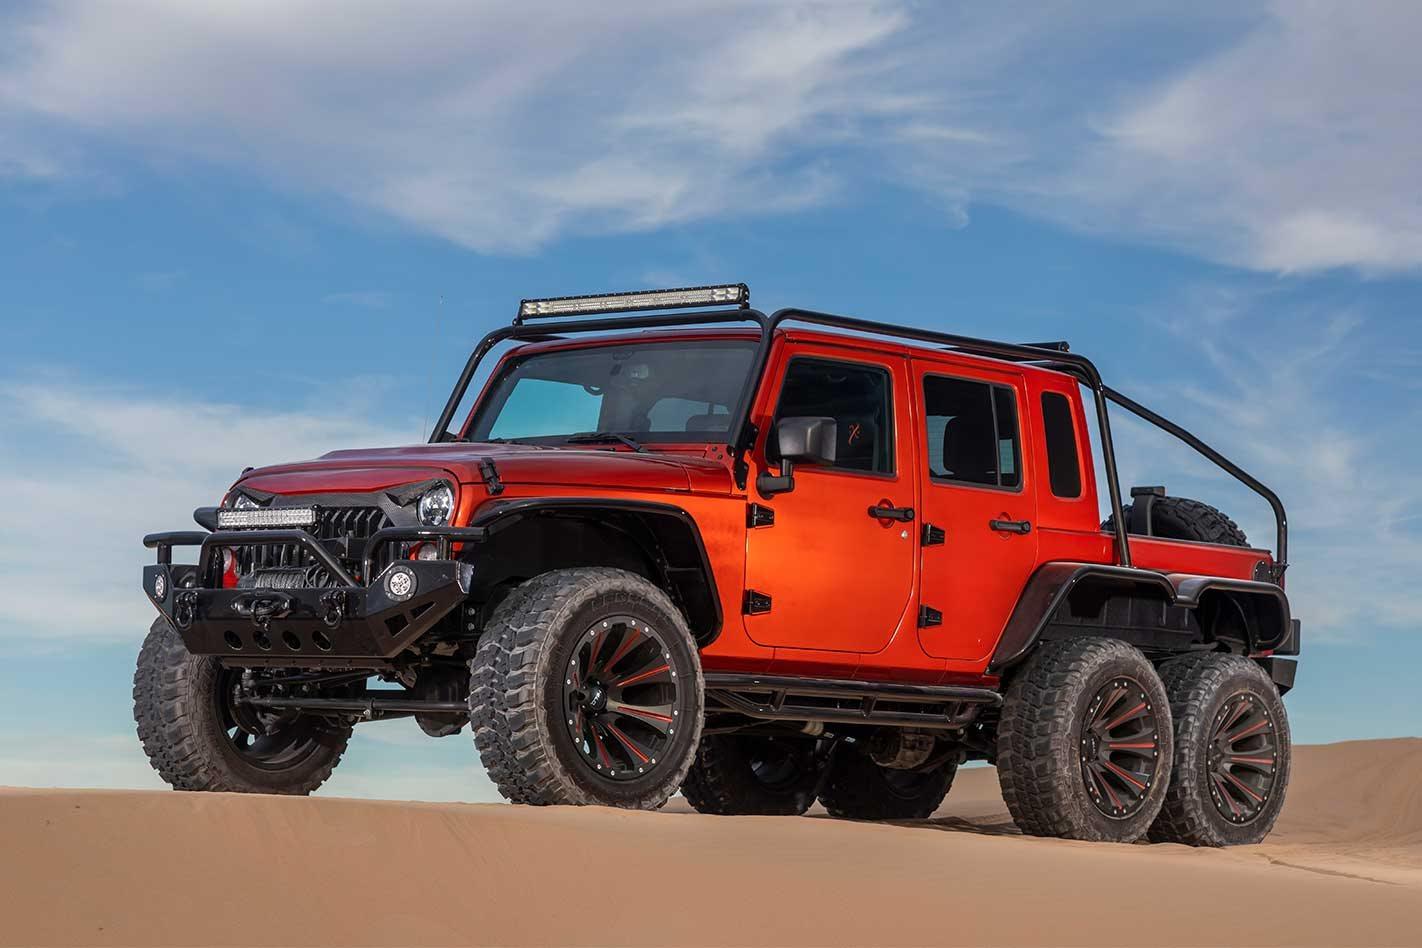 Hellcat V8 Powered Jeep Jk Wrangler 6x6 Ute Feature 4x4 Australia